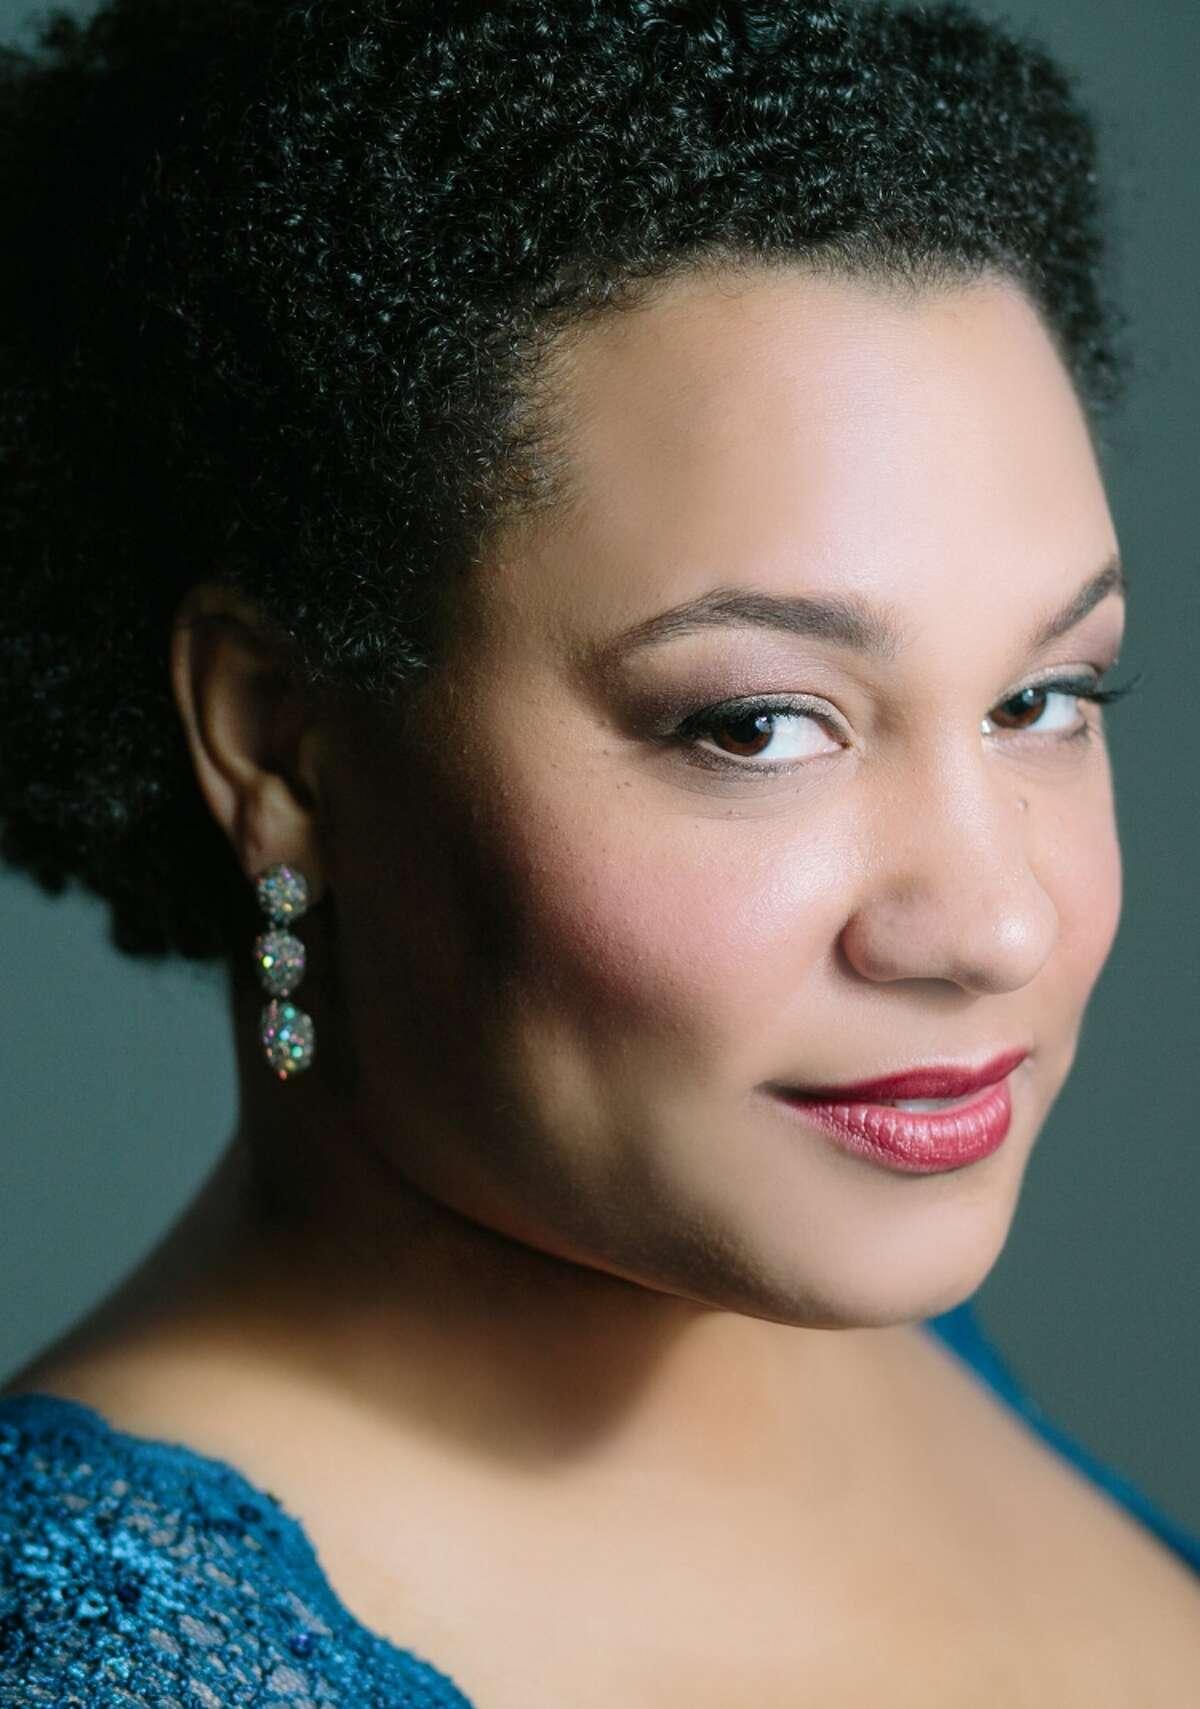 Deborah Nansteel, who sings the role of Mother in